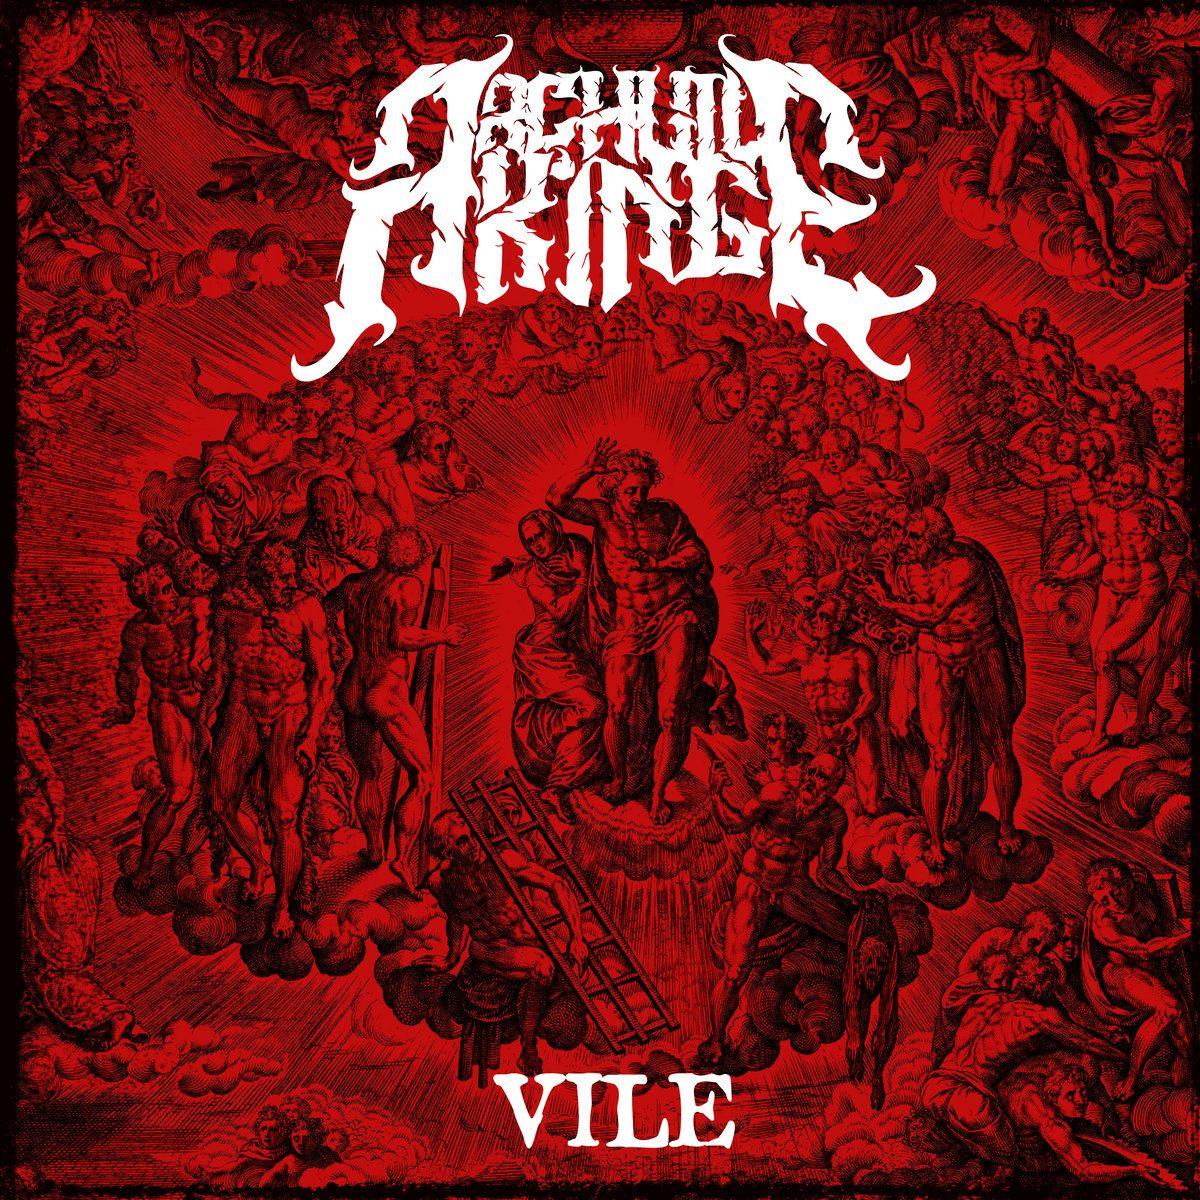 Review for Archvile King - Vile